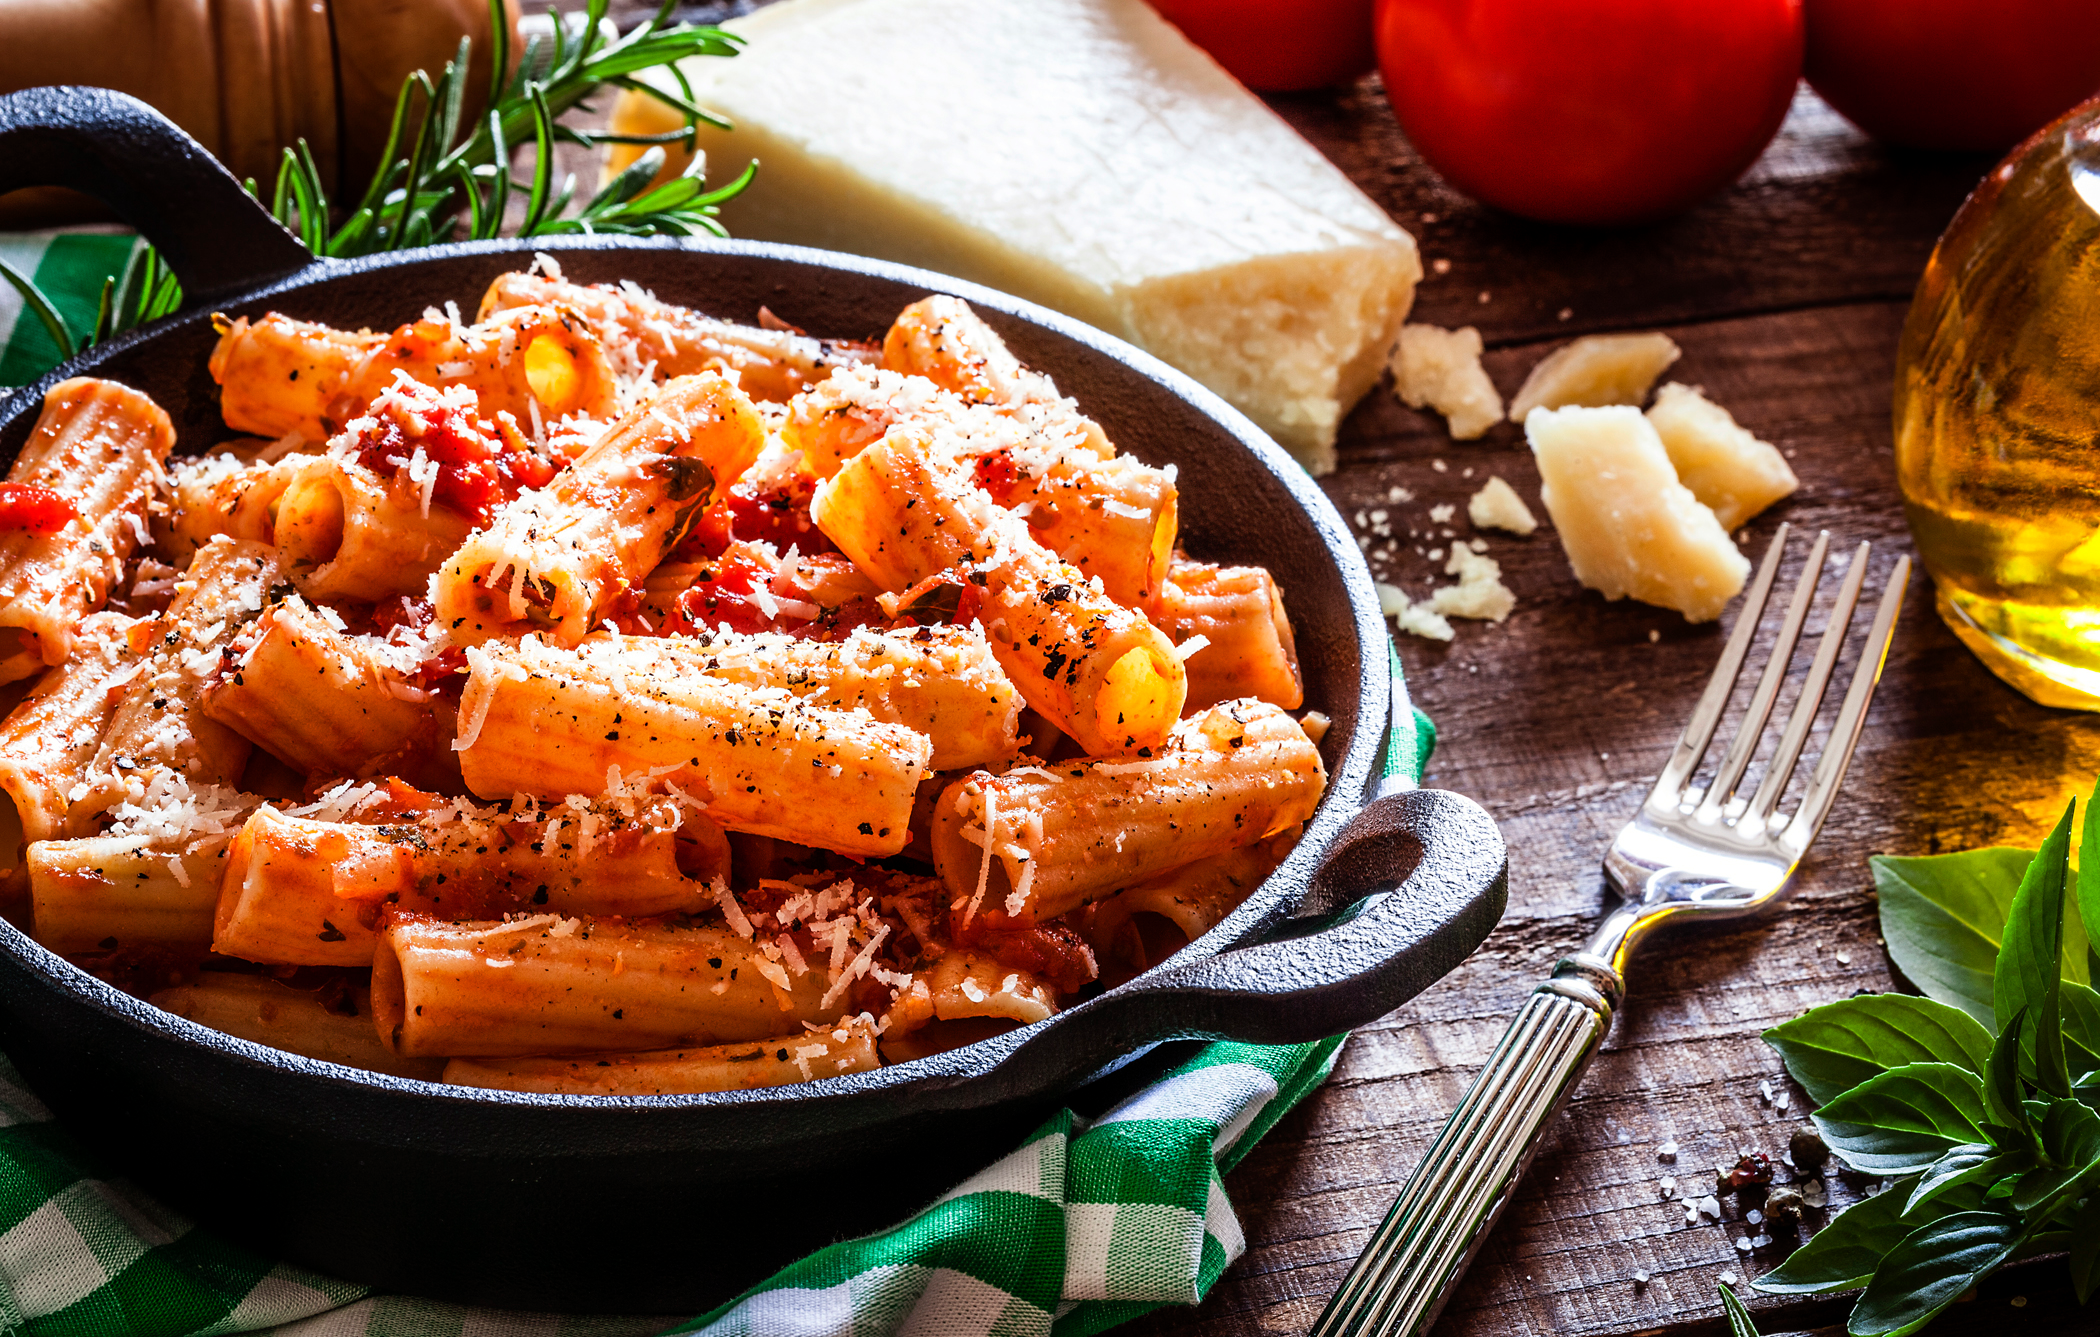 italienisch-kochen-luebbecke-bg4